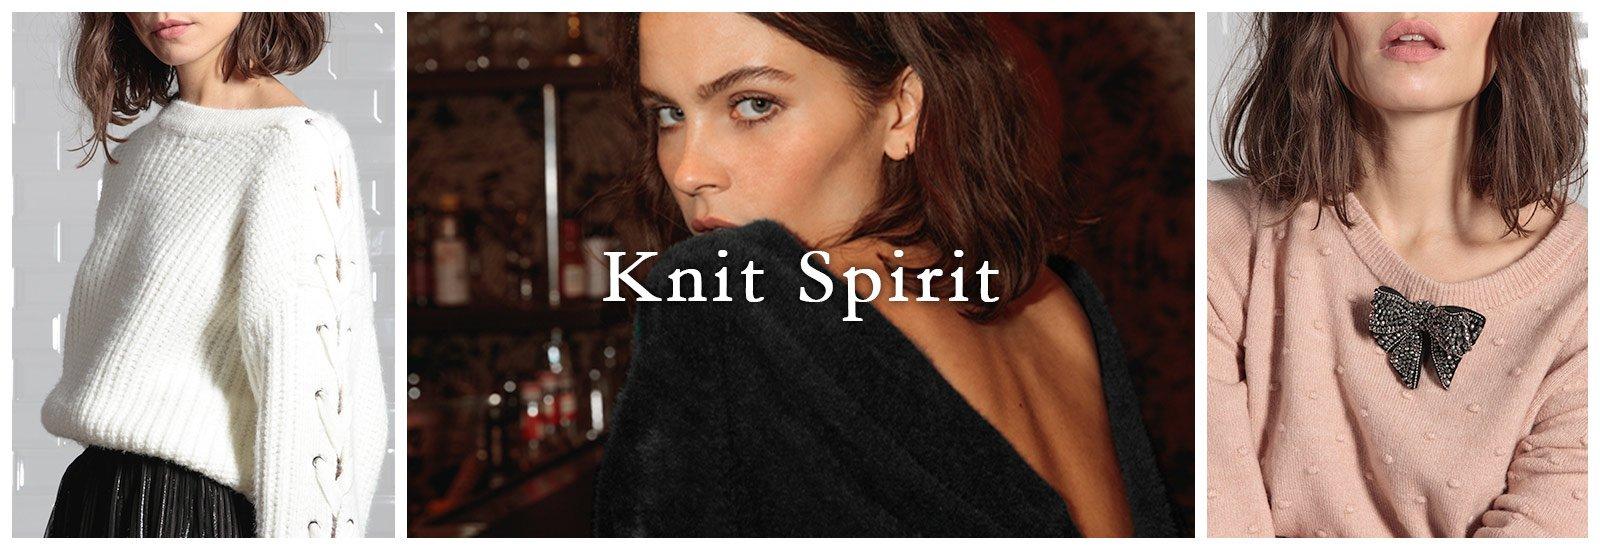 Knit spirit ❤